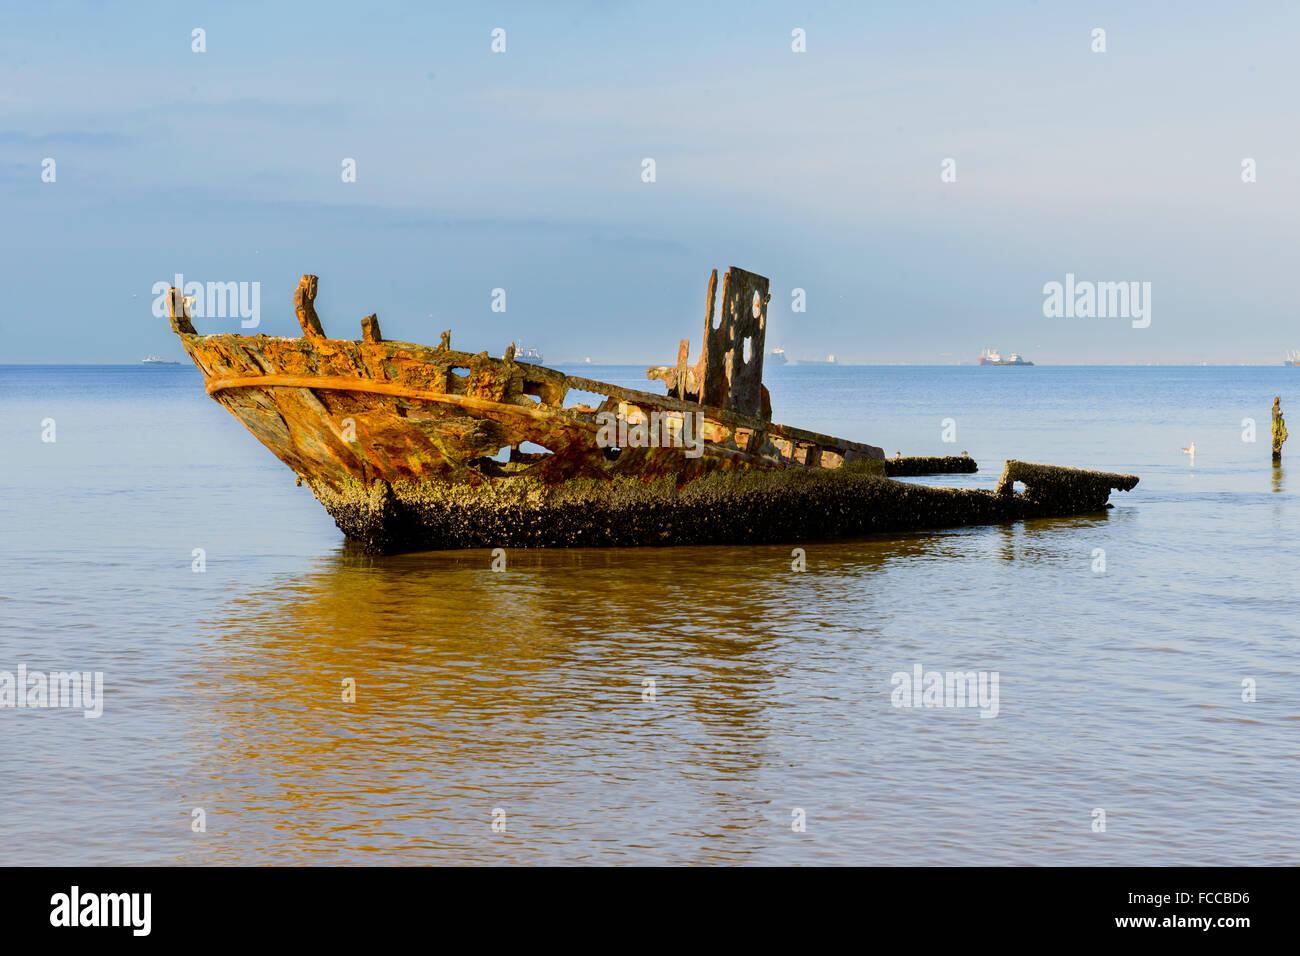 Old shipwreck, Walvis Bay, Skeleton Coat, Namibia - Stock Image